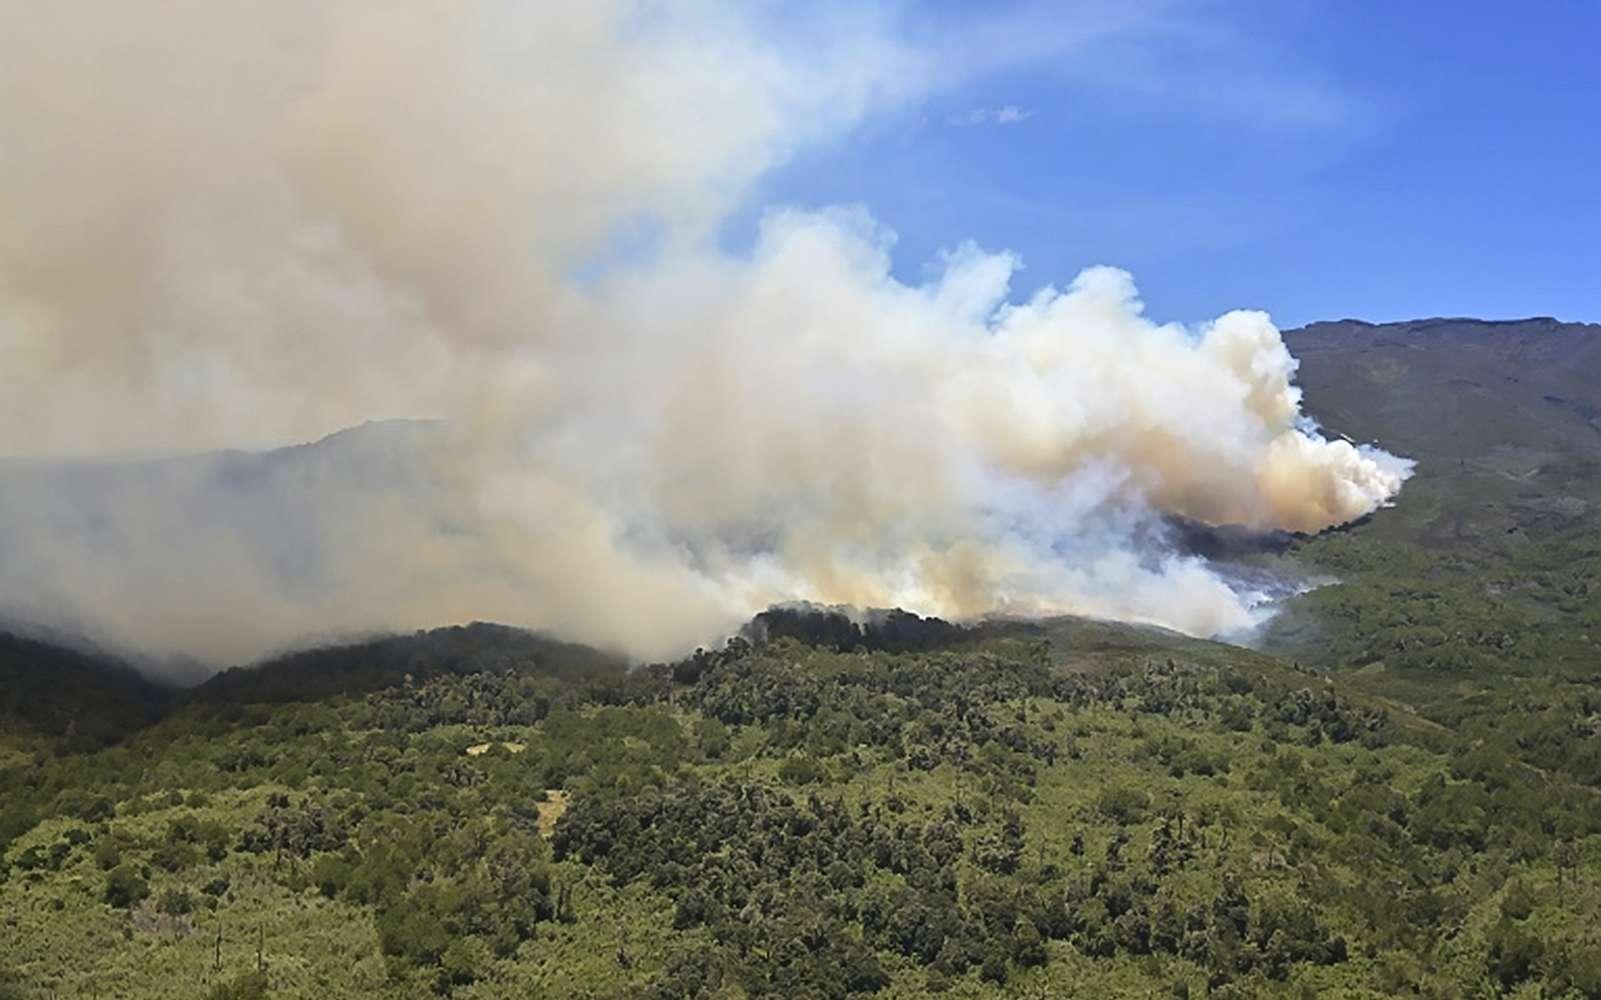 Incendie de forêt dans le parc national du Mont Kenya, le 1er mars 2019. © Tony Karumba, AFP, Archives